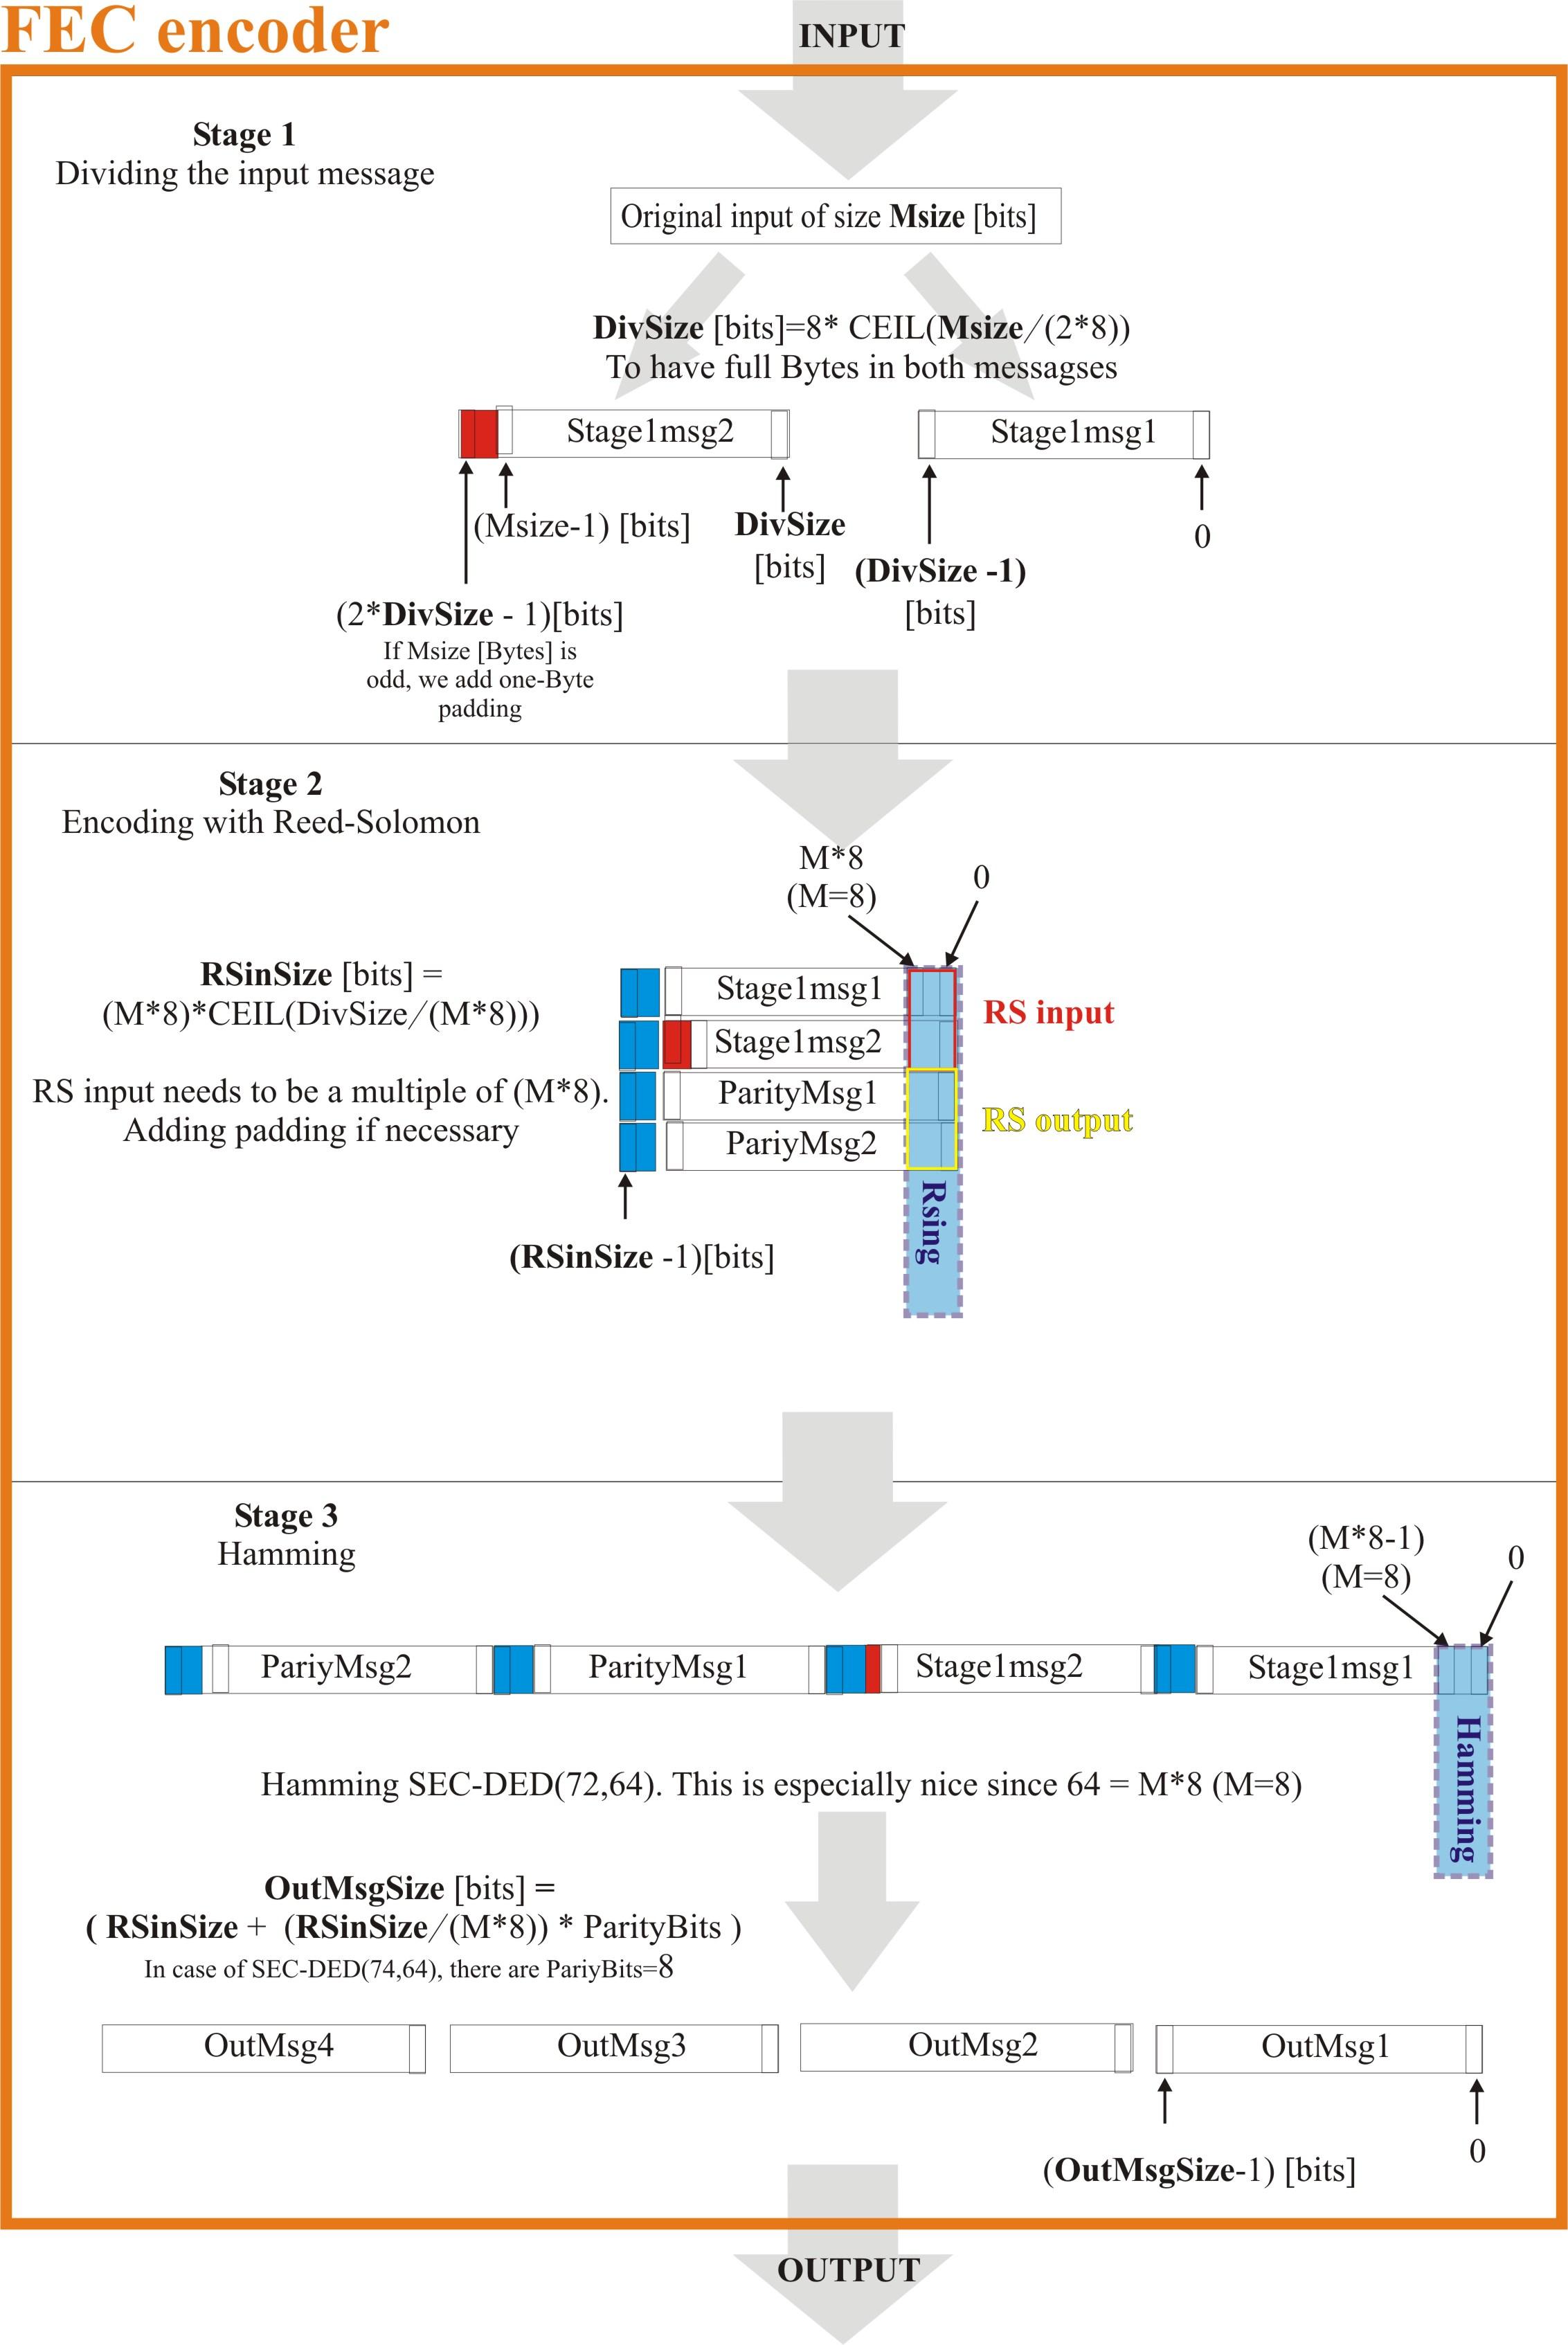 documents/specifications/robustness/wr_fec/FECencoding.jpg